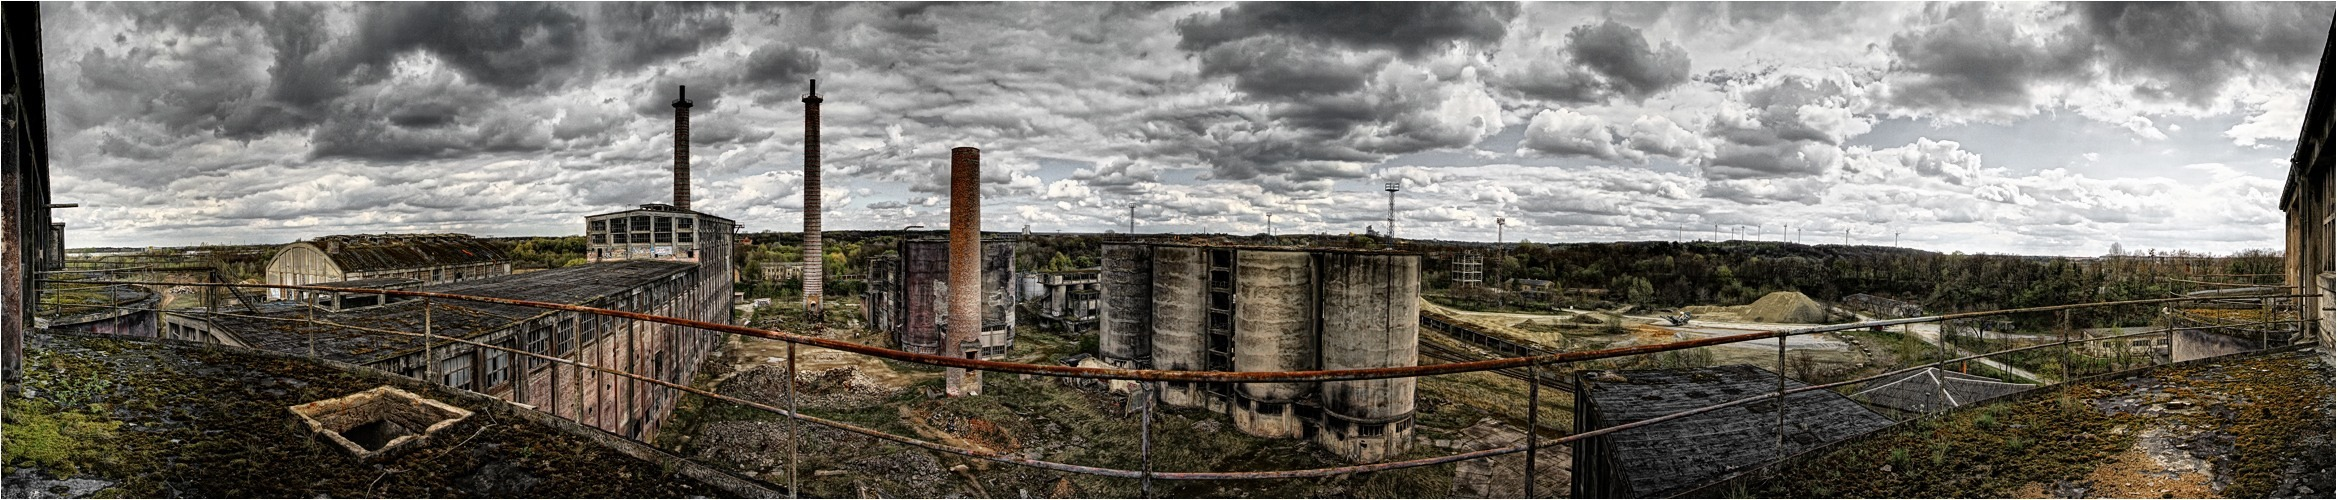 Weltuntergangs-Panorama